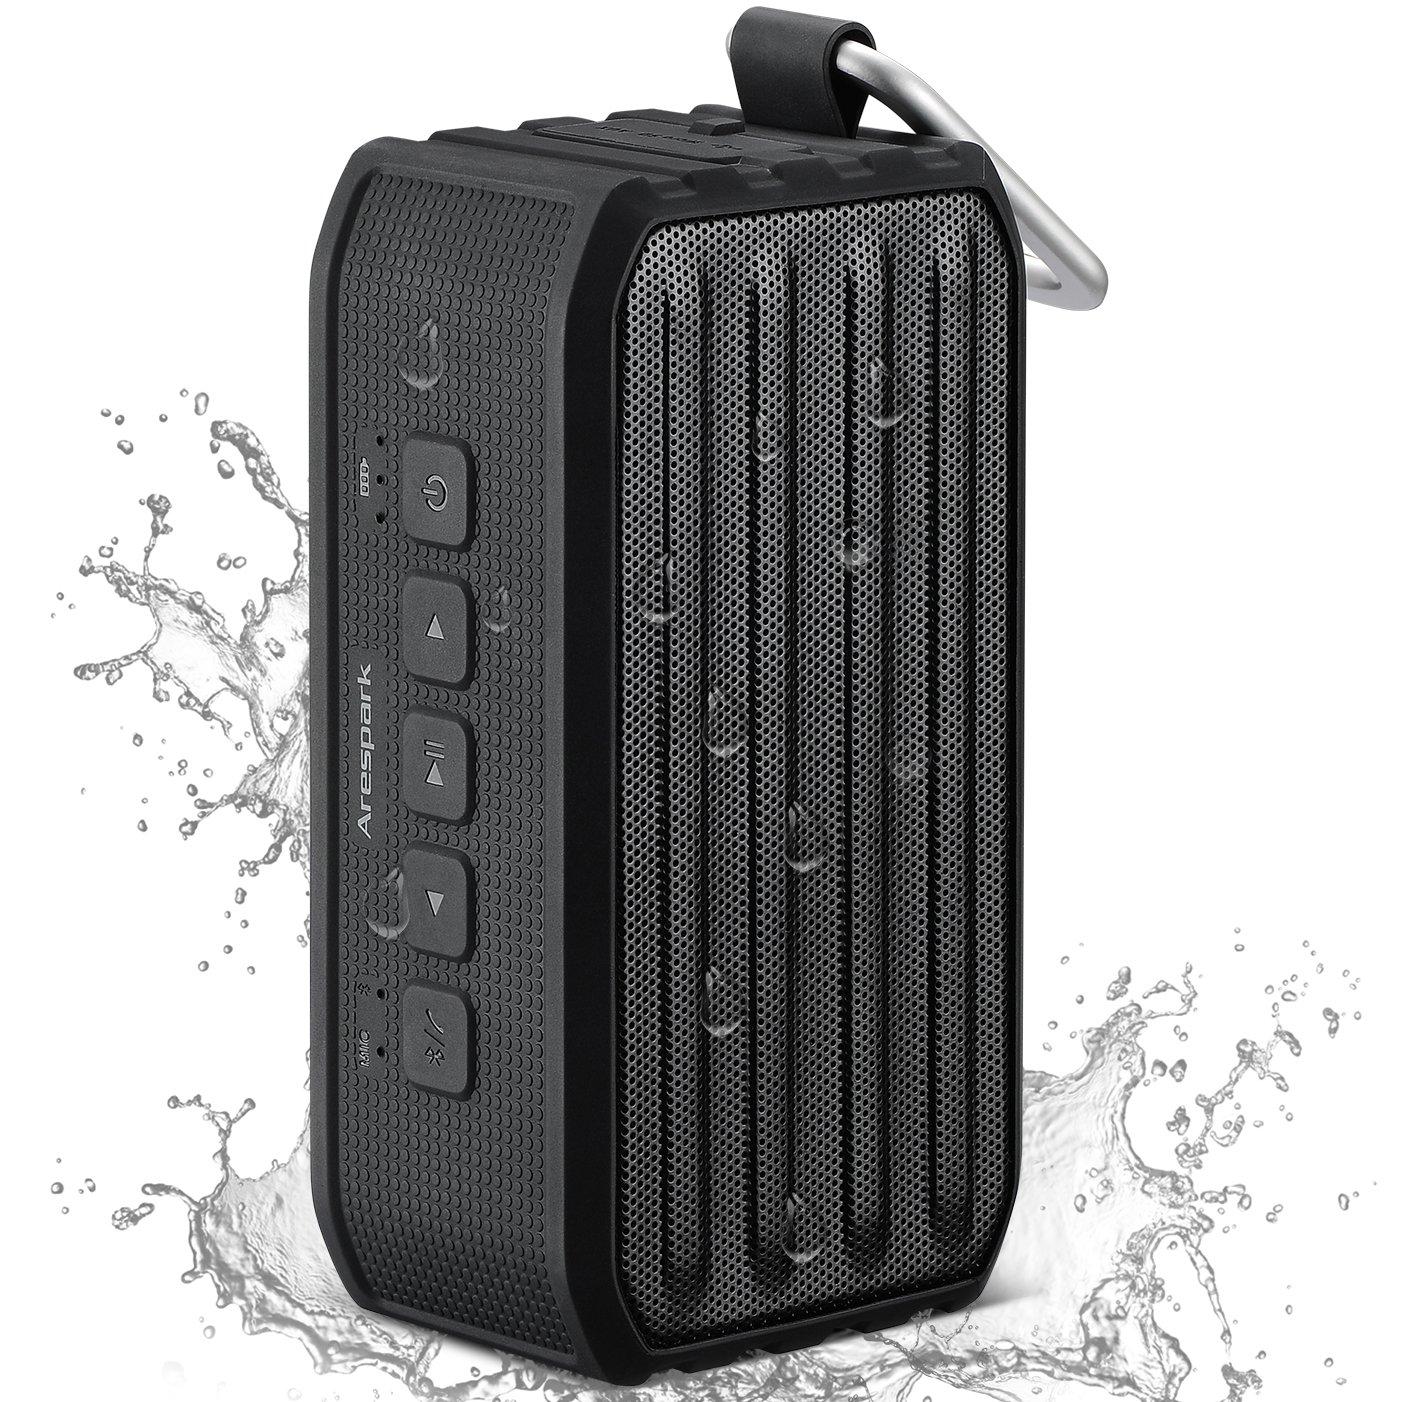 Arespark 4.0 Outdoor Bluetooth Speaker